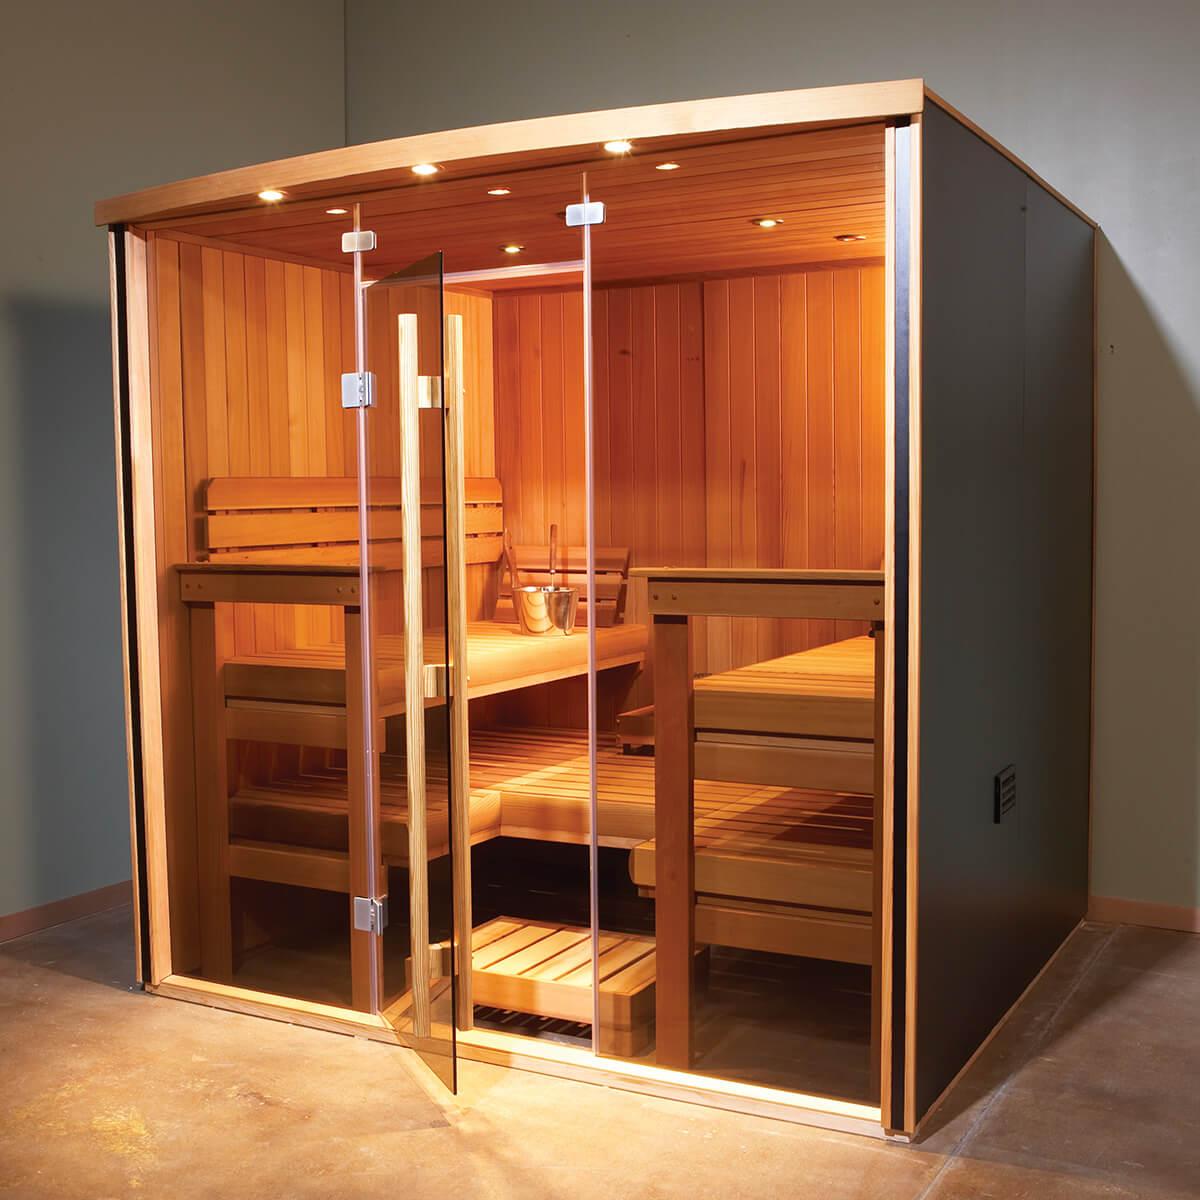 Why You Should Own a helo Sauna